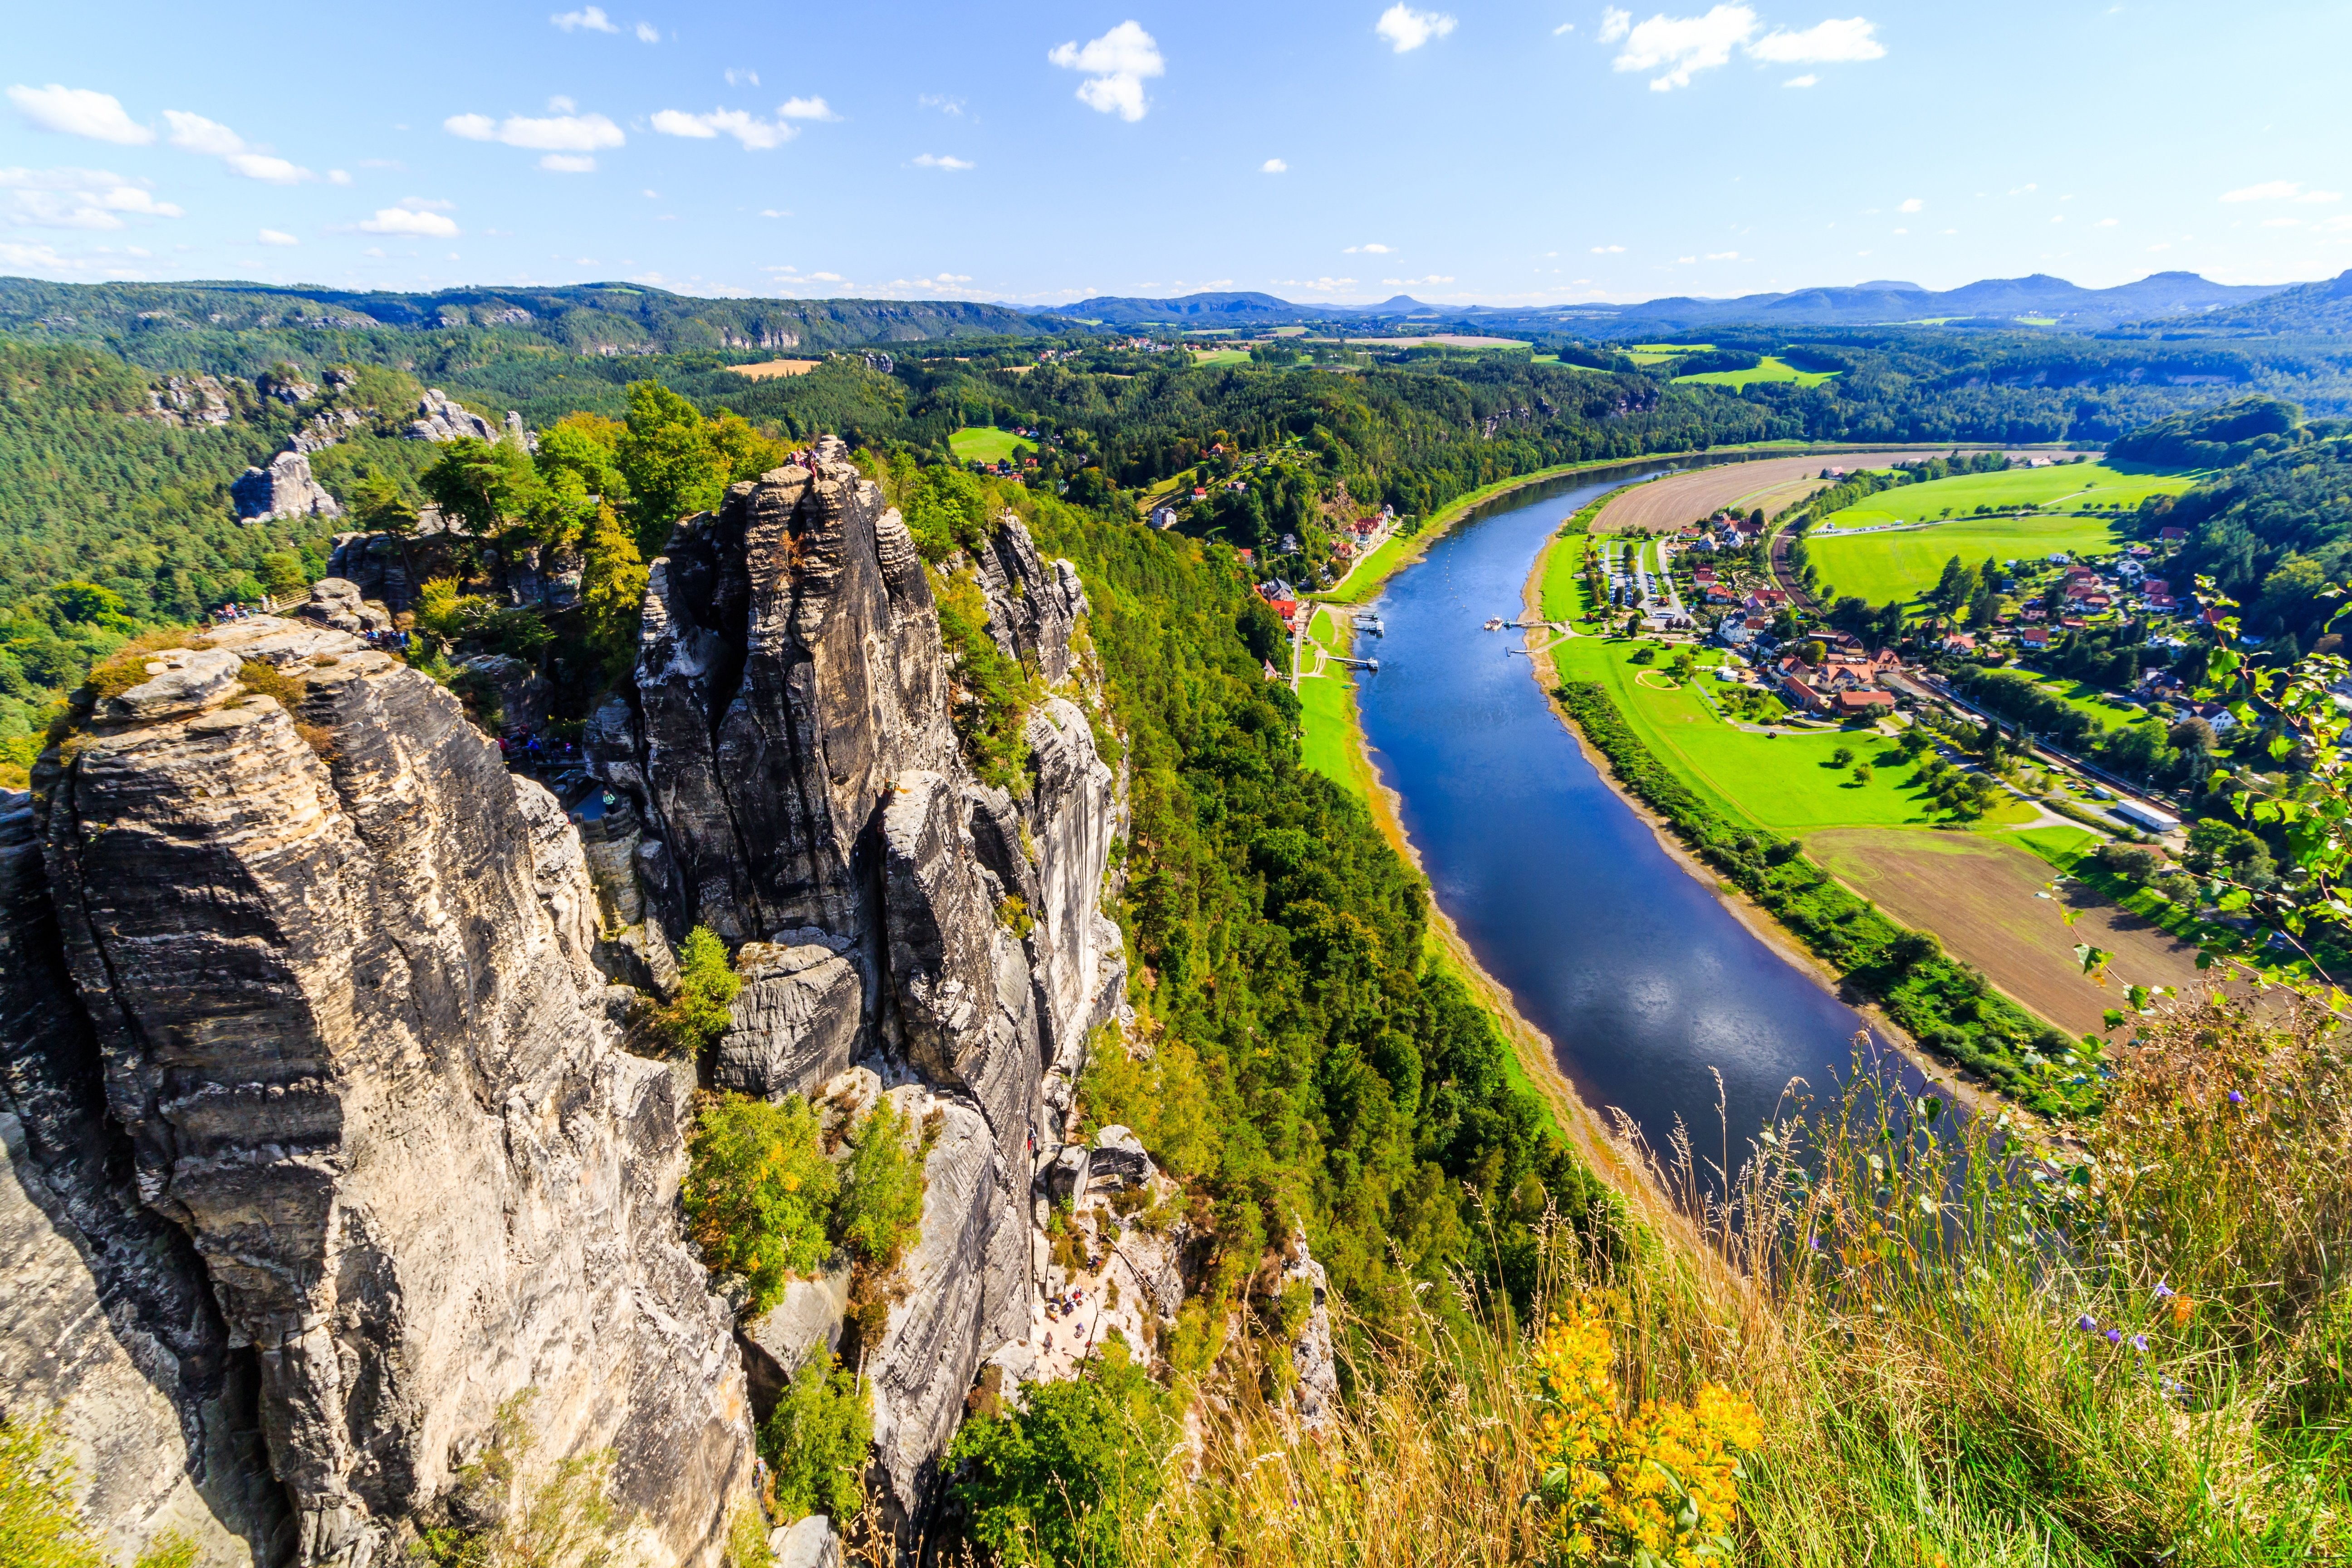 Elbe River in Germany